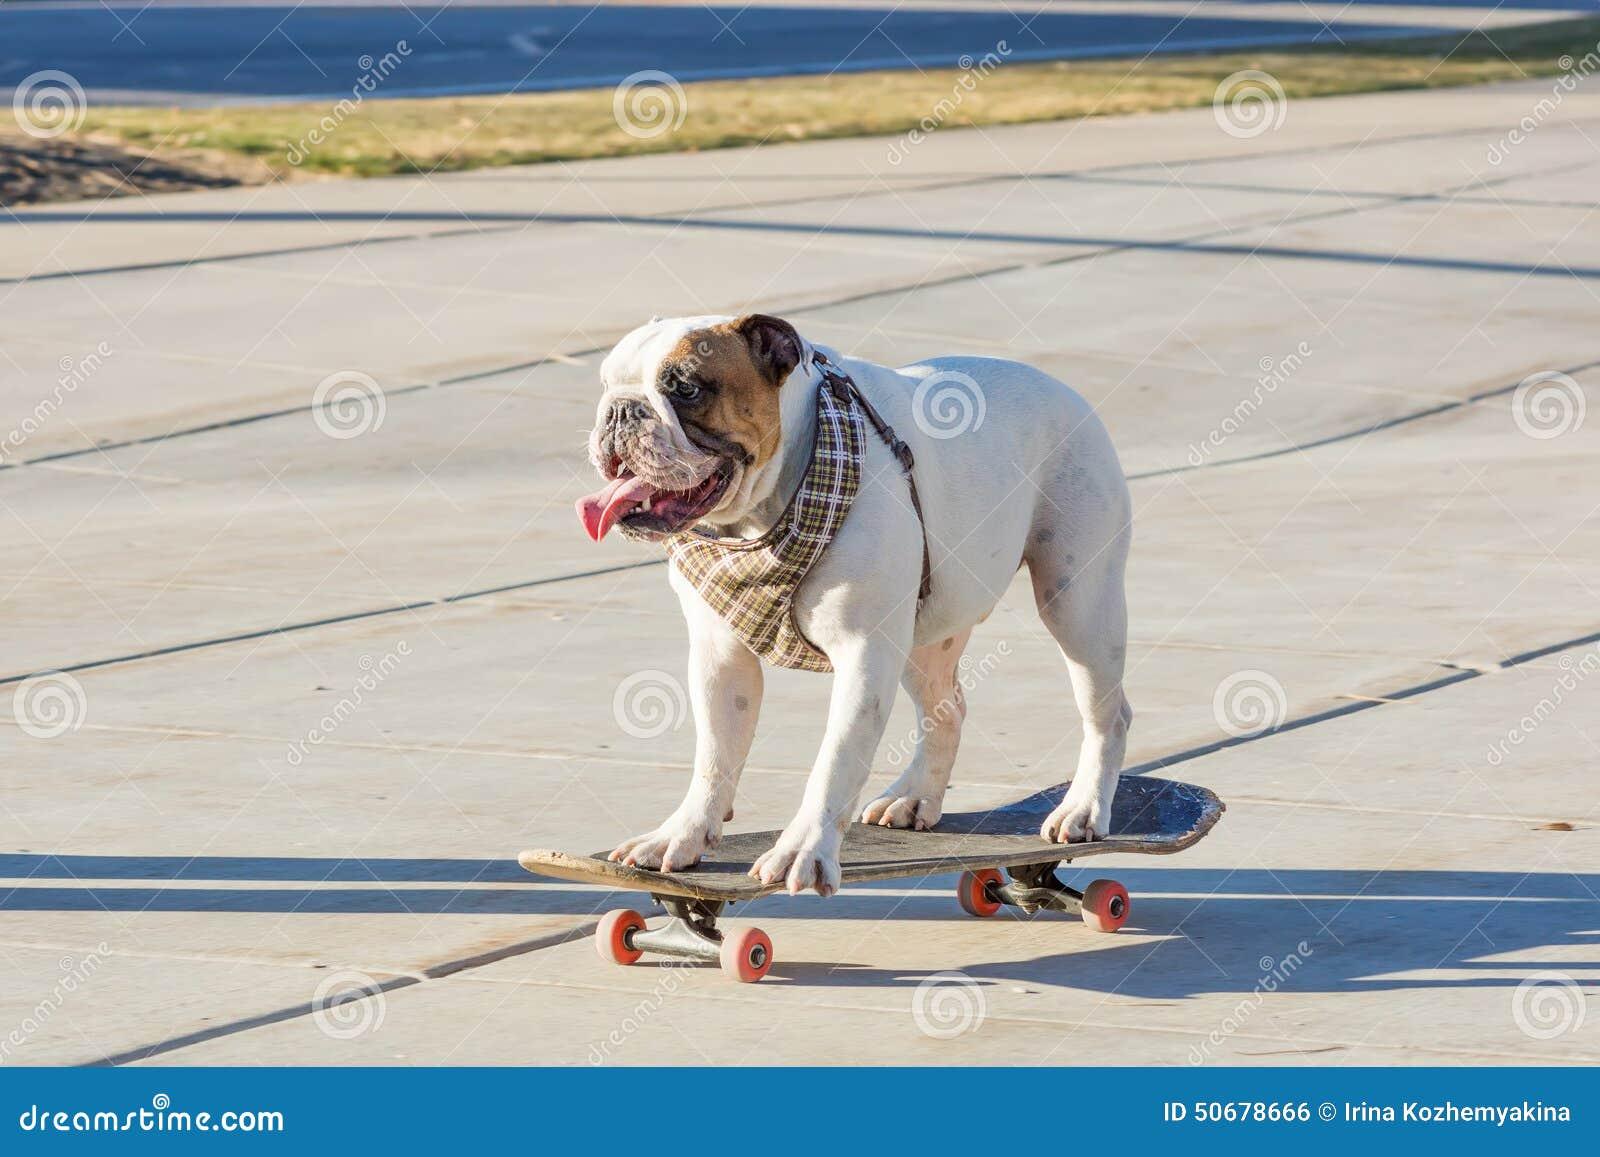 Download 乘坐滑板的英国牛头犬在街道 库存照片. 图片 包括有 户外, 滑稽, 质朴, 似犬, 可笑, 溜冰者, 溜冰板者 - 50678666